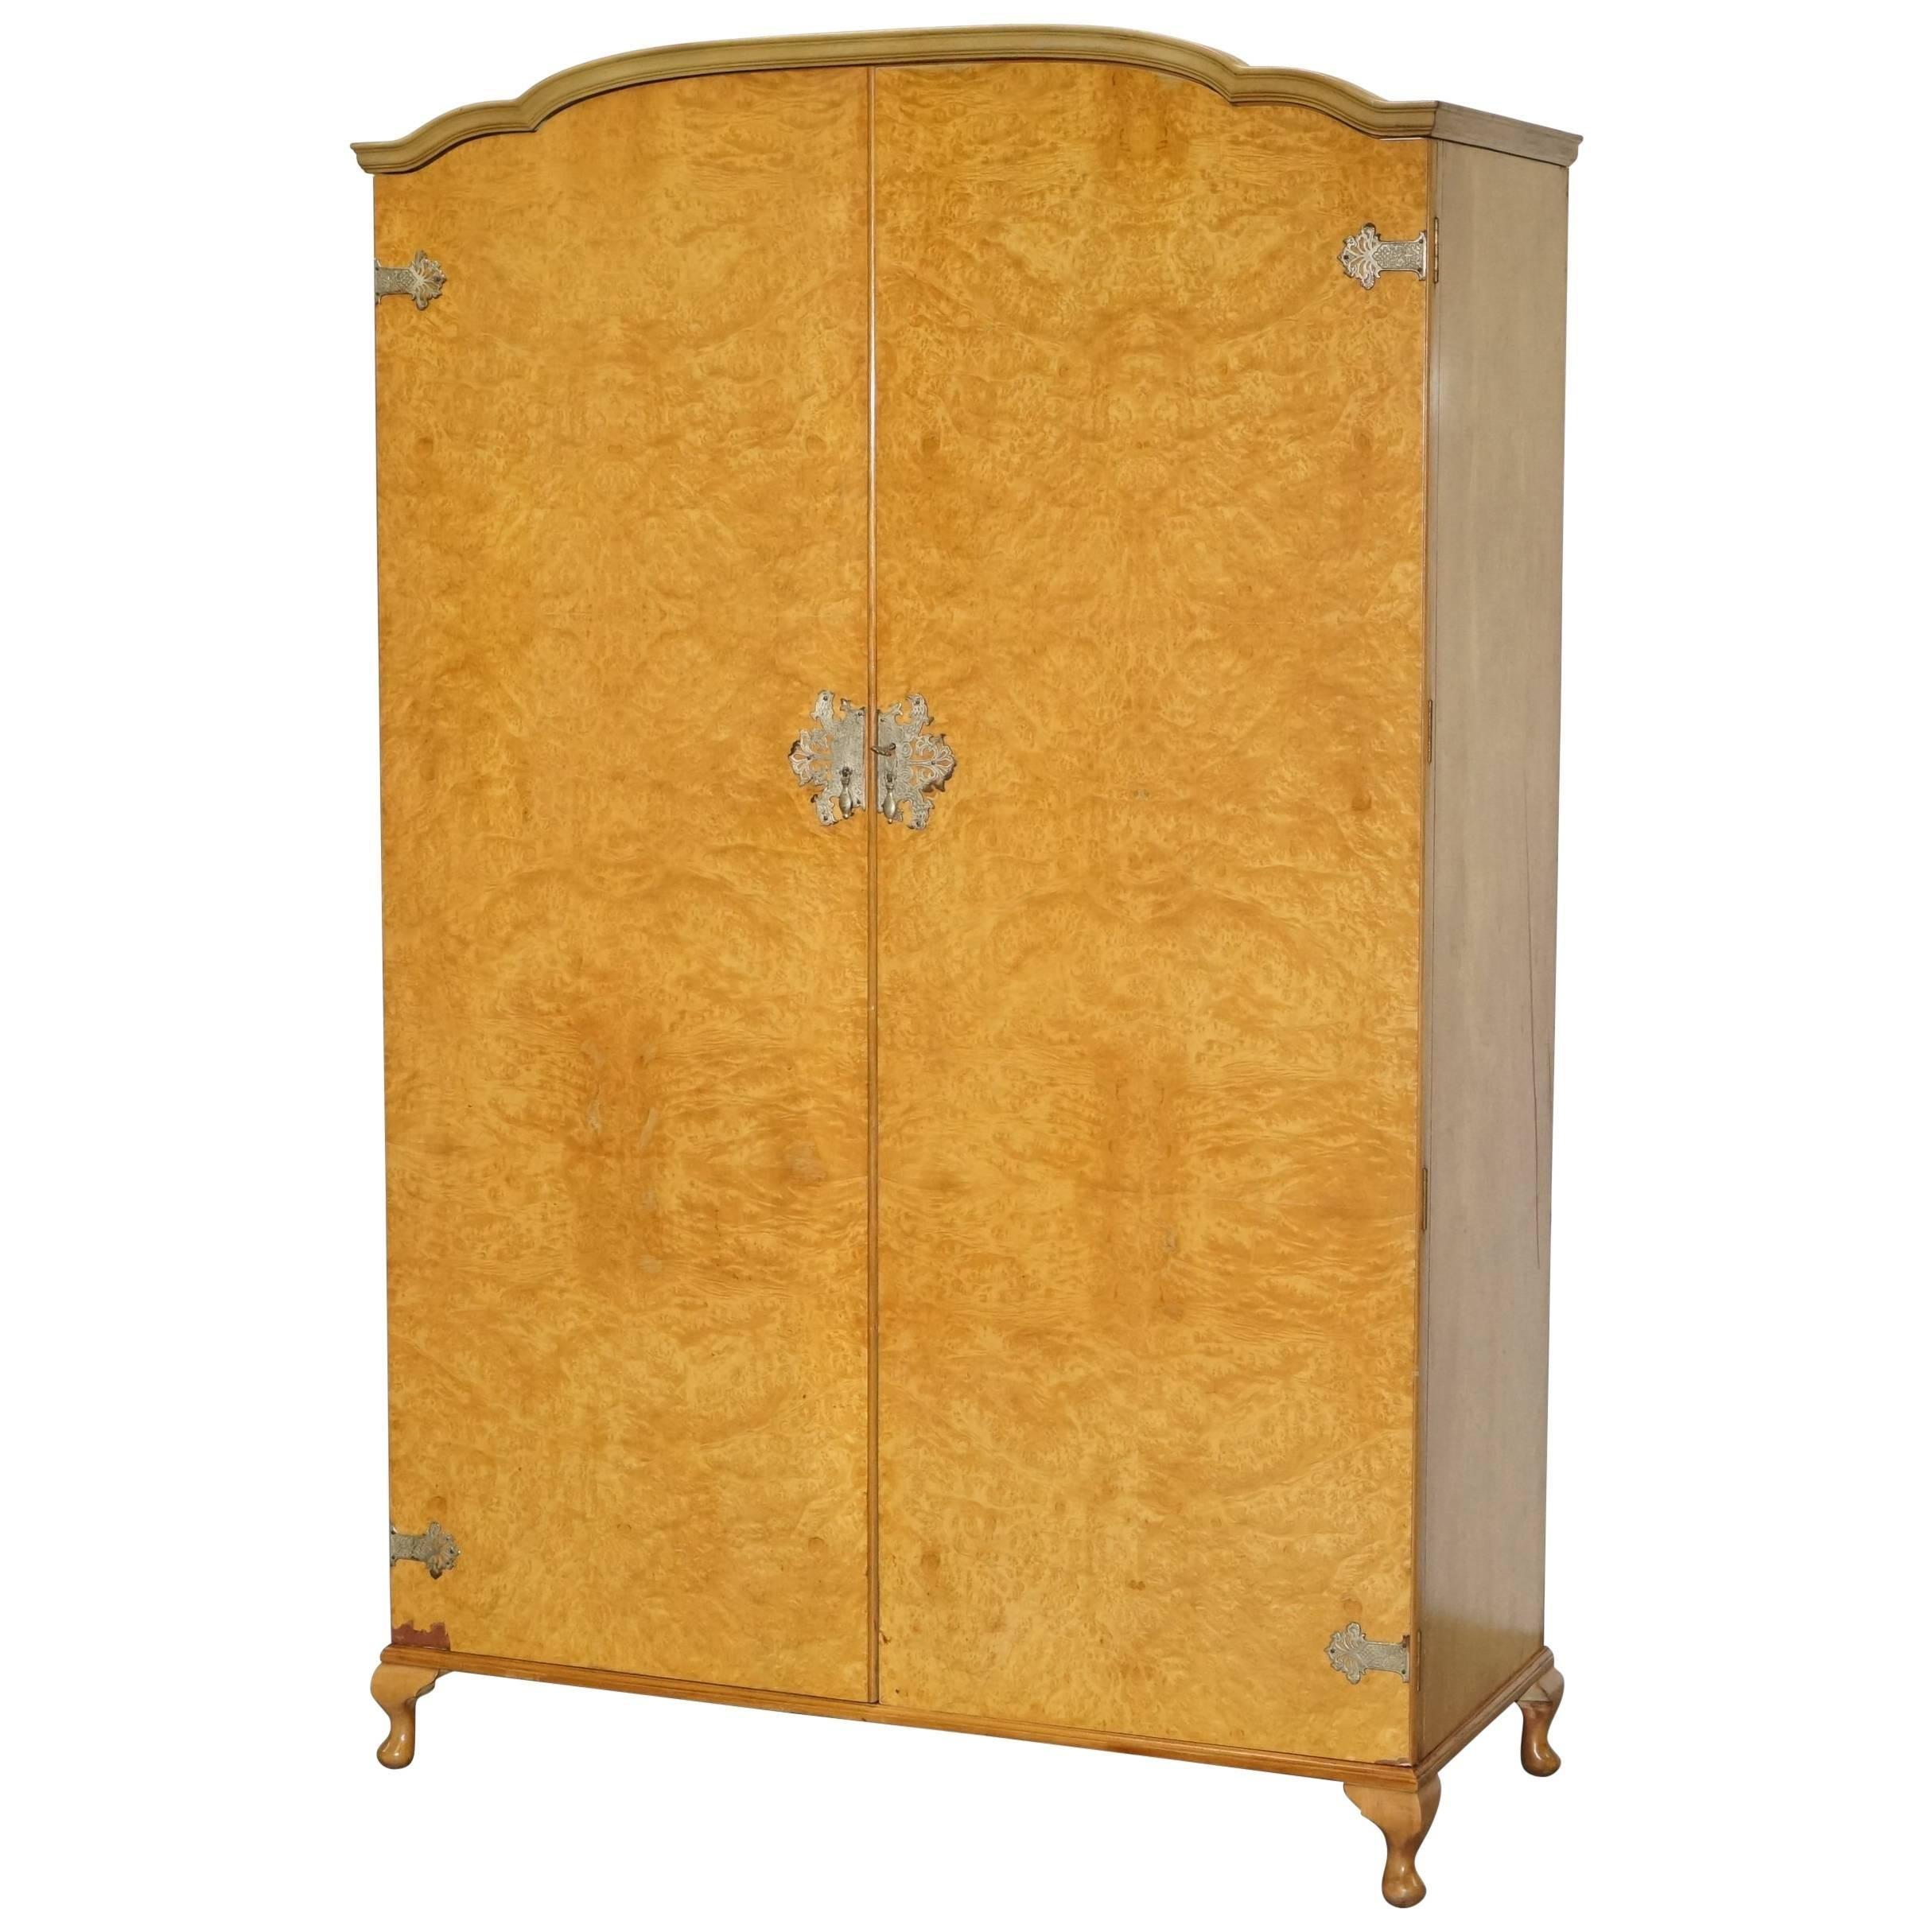 Attrayant 1 Of 2 His U0026 Hers Midcentury Burr Walnut Wardrobes Heirloom Furniture Est  1889 For Sale